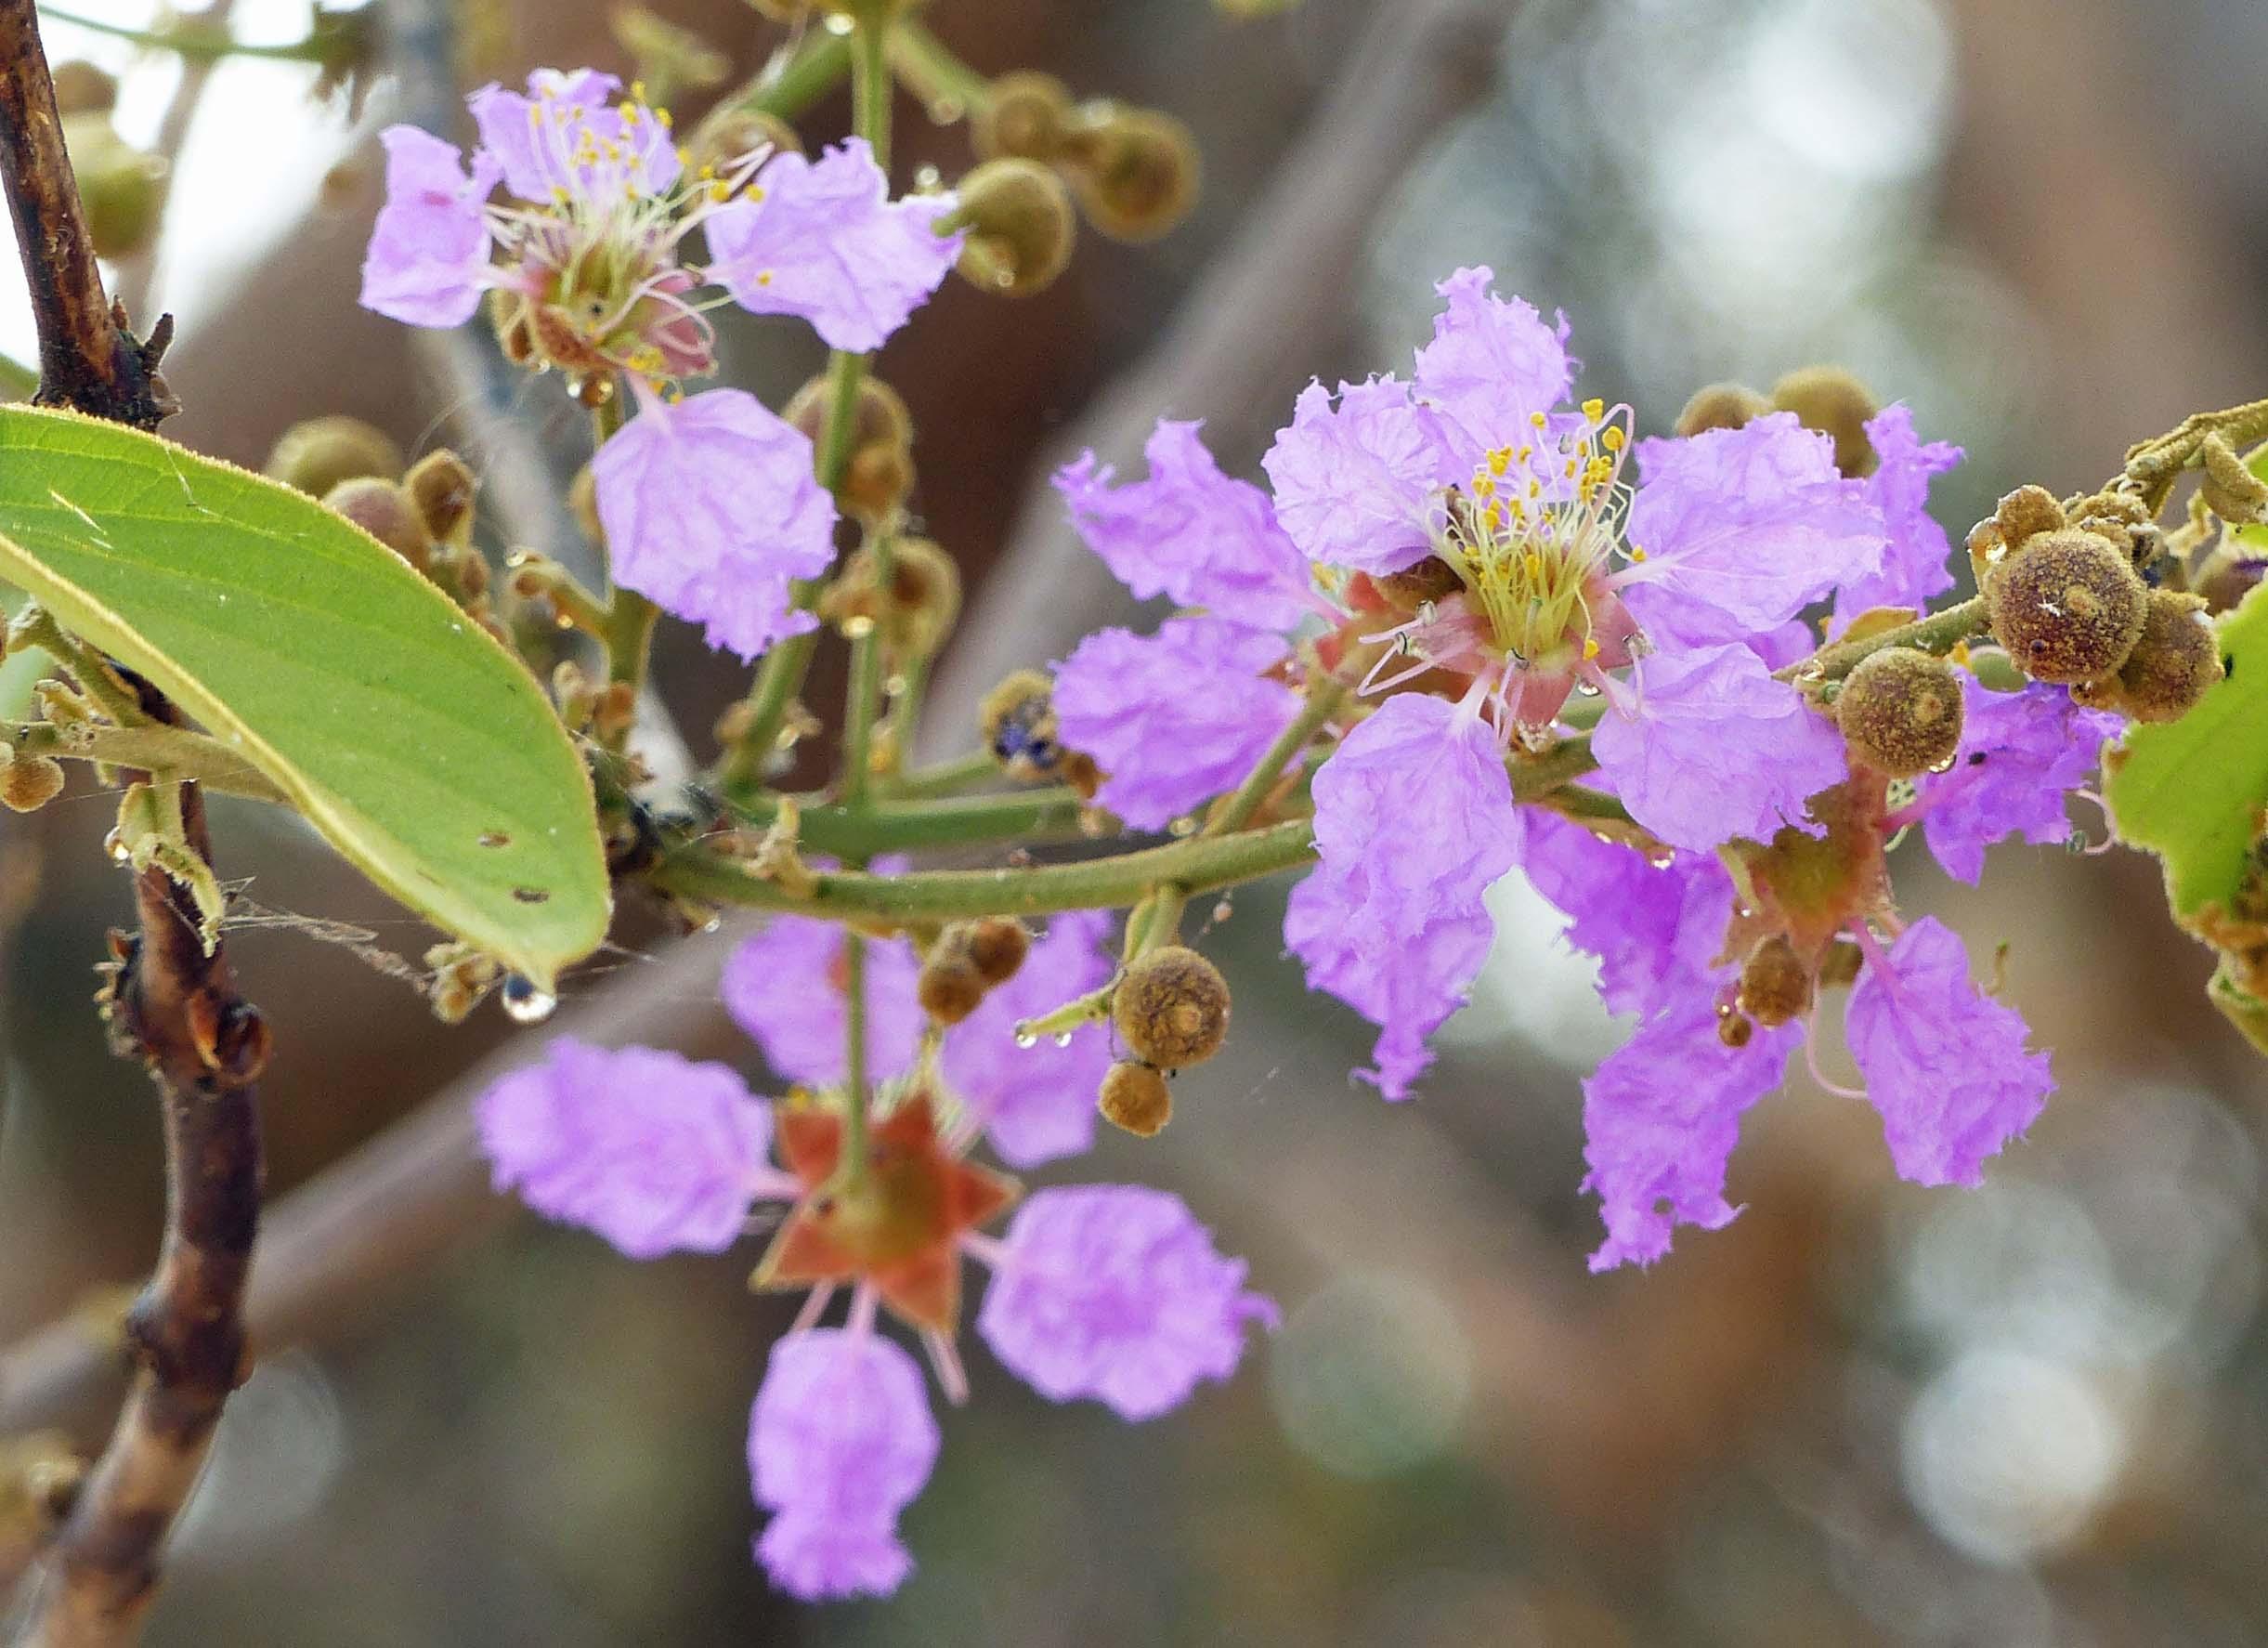 Small mauve blossoms